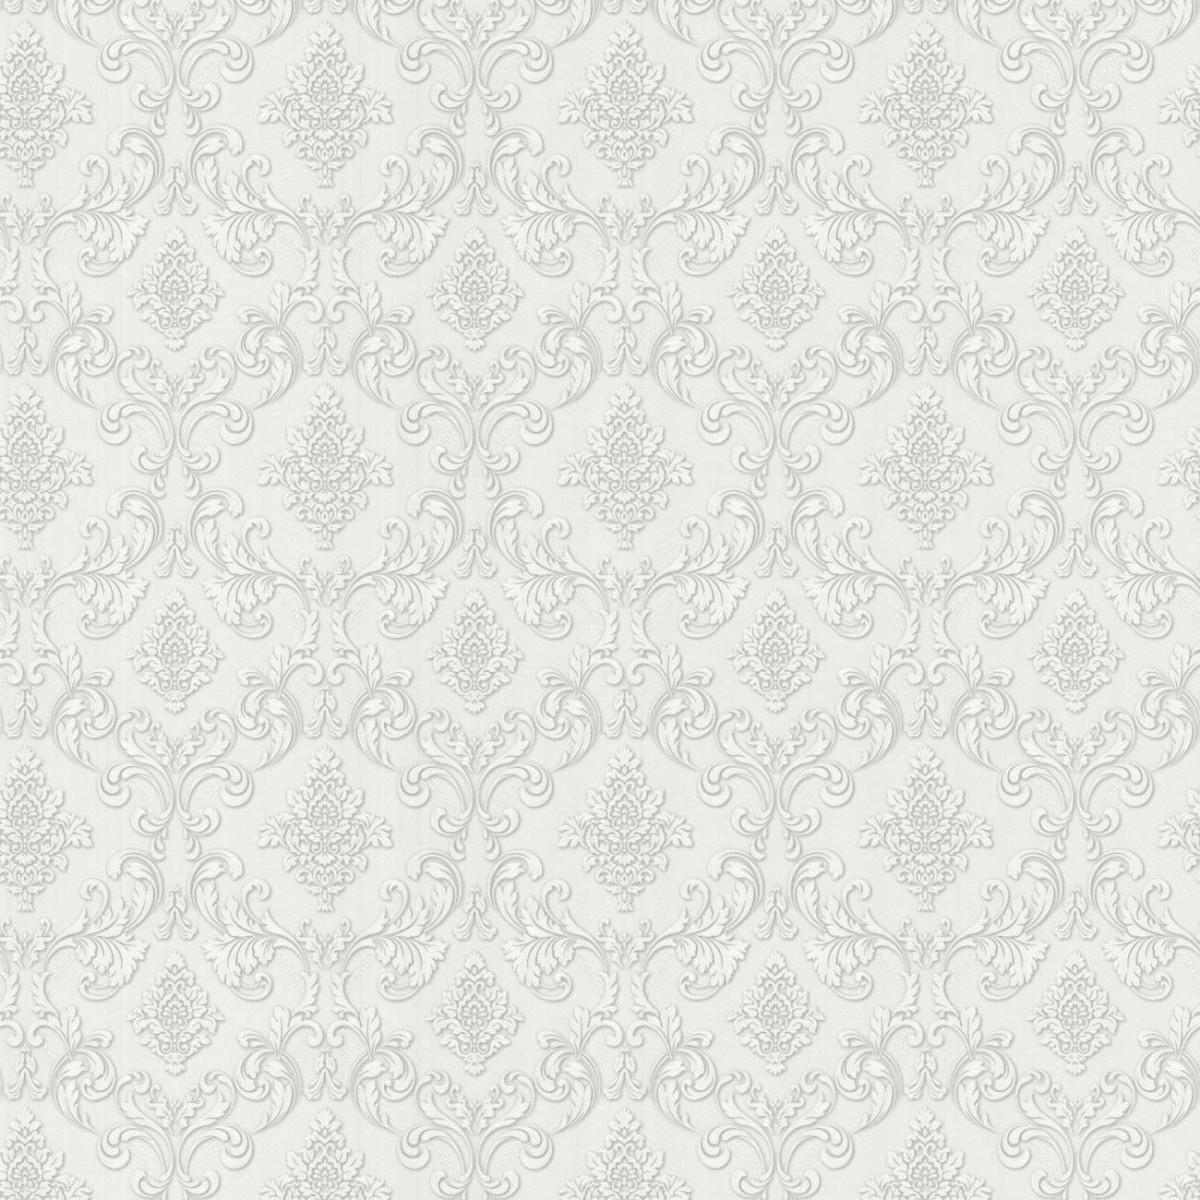 Обои флизелиновые Мир Авангард белые 1.06 м 45-217-06